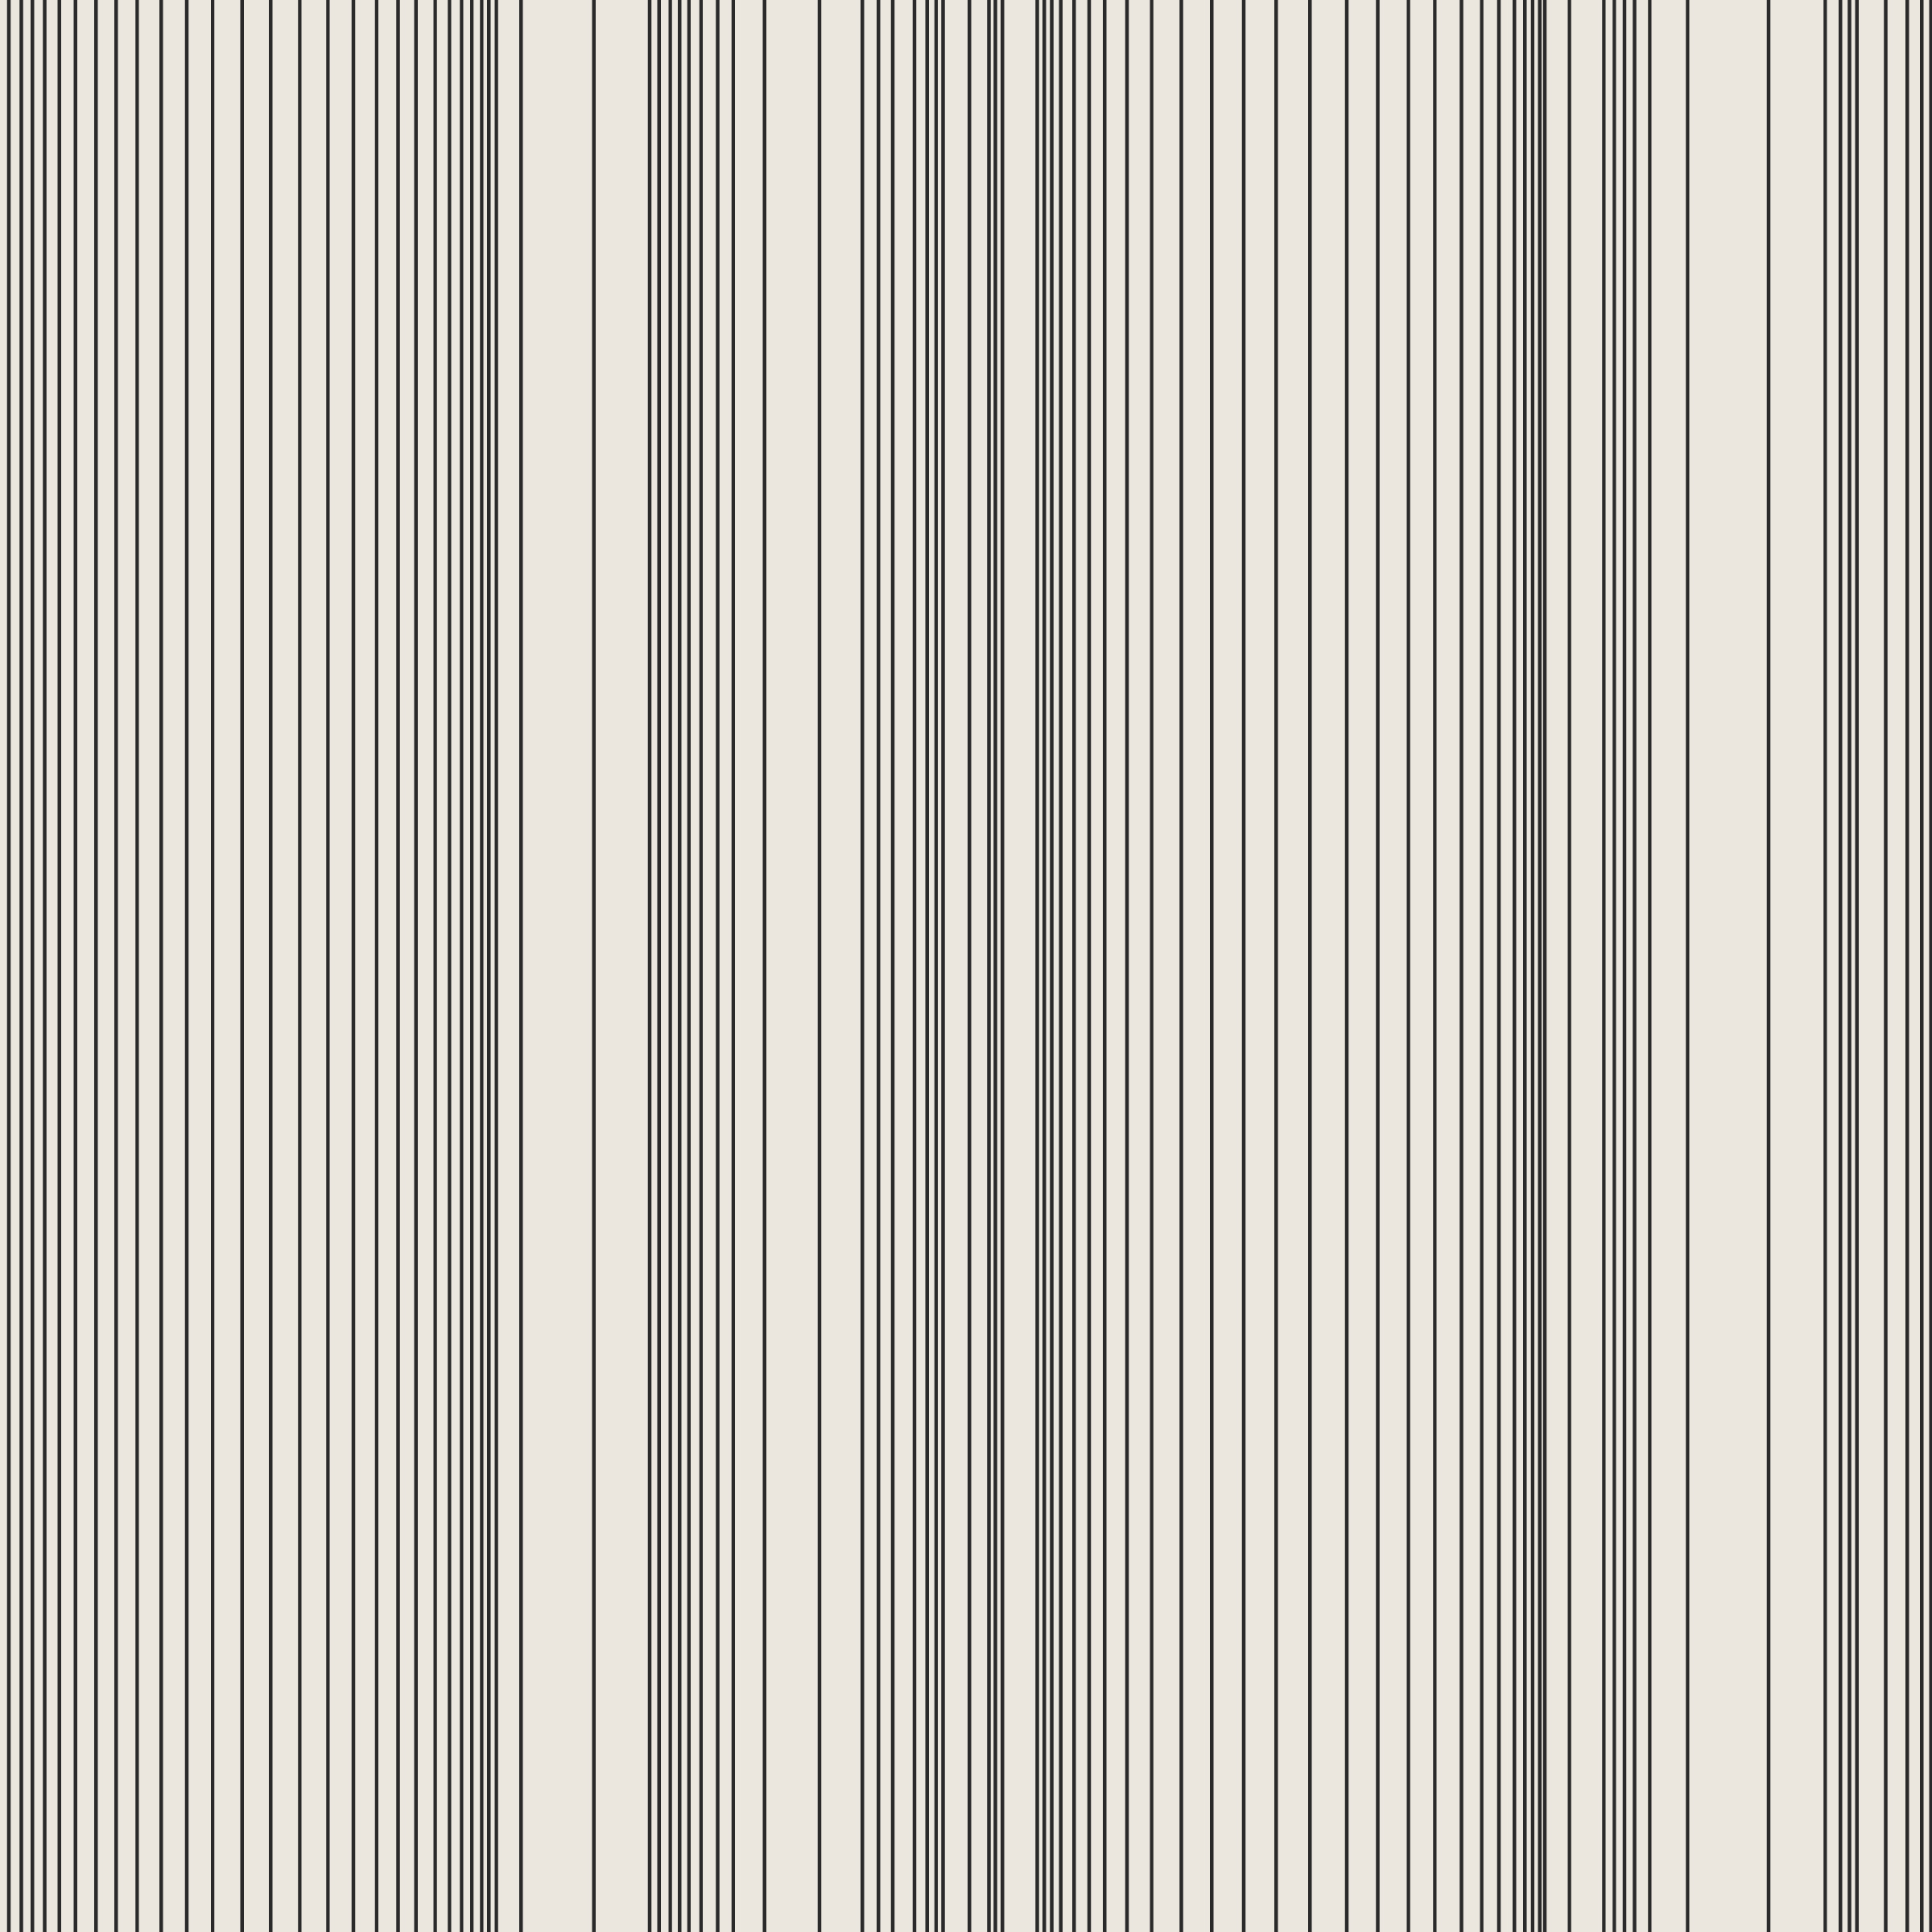 Encoded Stripe - Black and White